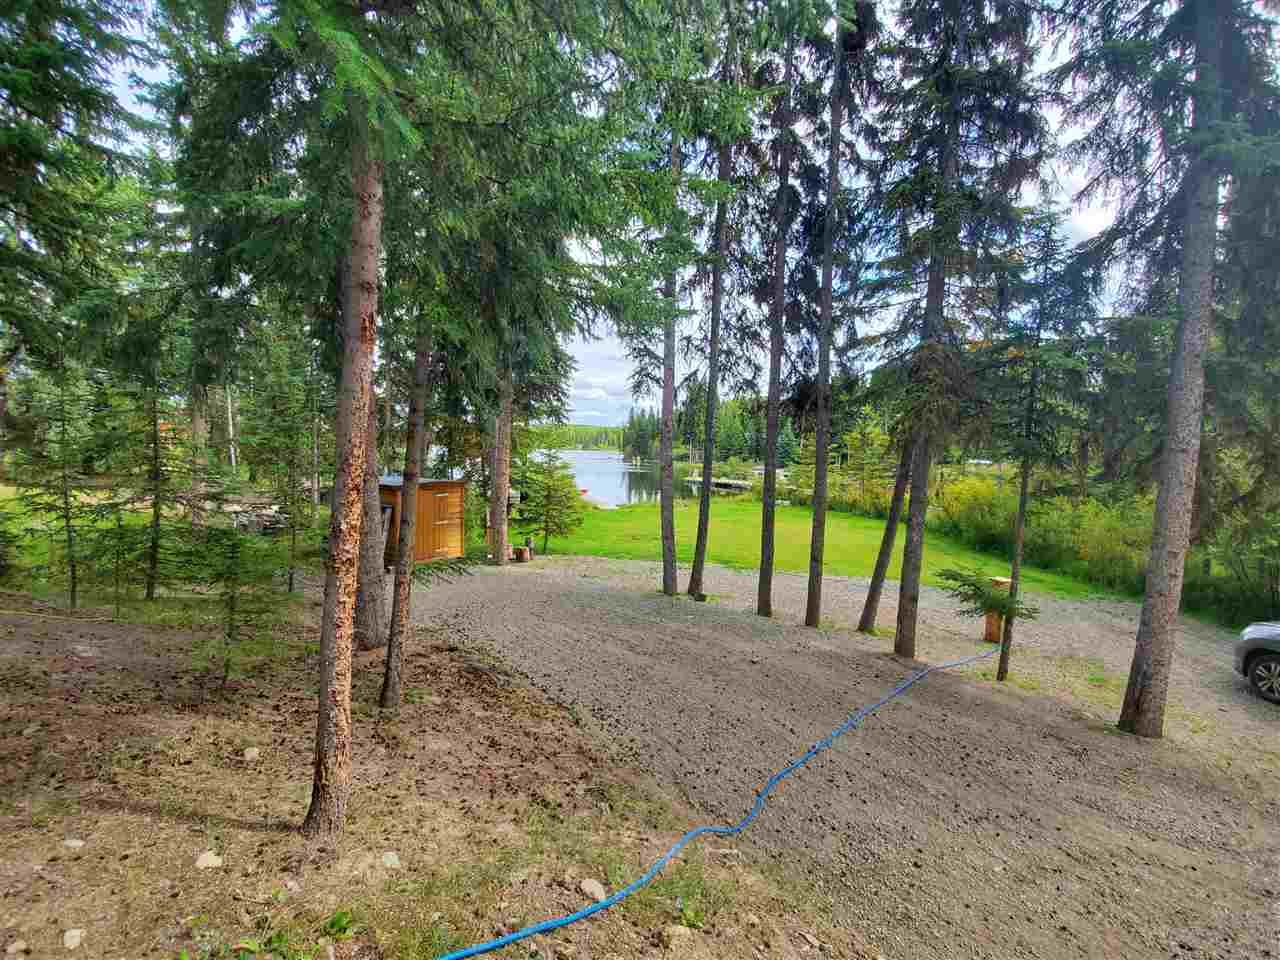 Photo 8: Photos: 7271 NATH Road in Bridge Lake: Bridge Lake/Sheridan Lake Land for sale (100 Mile House (Zone 10))  : MLS®# R2496086